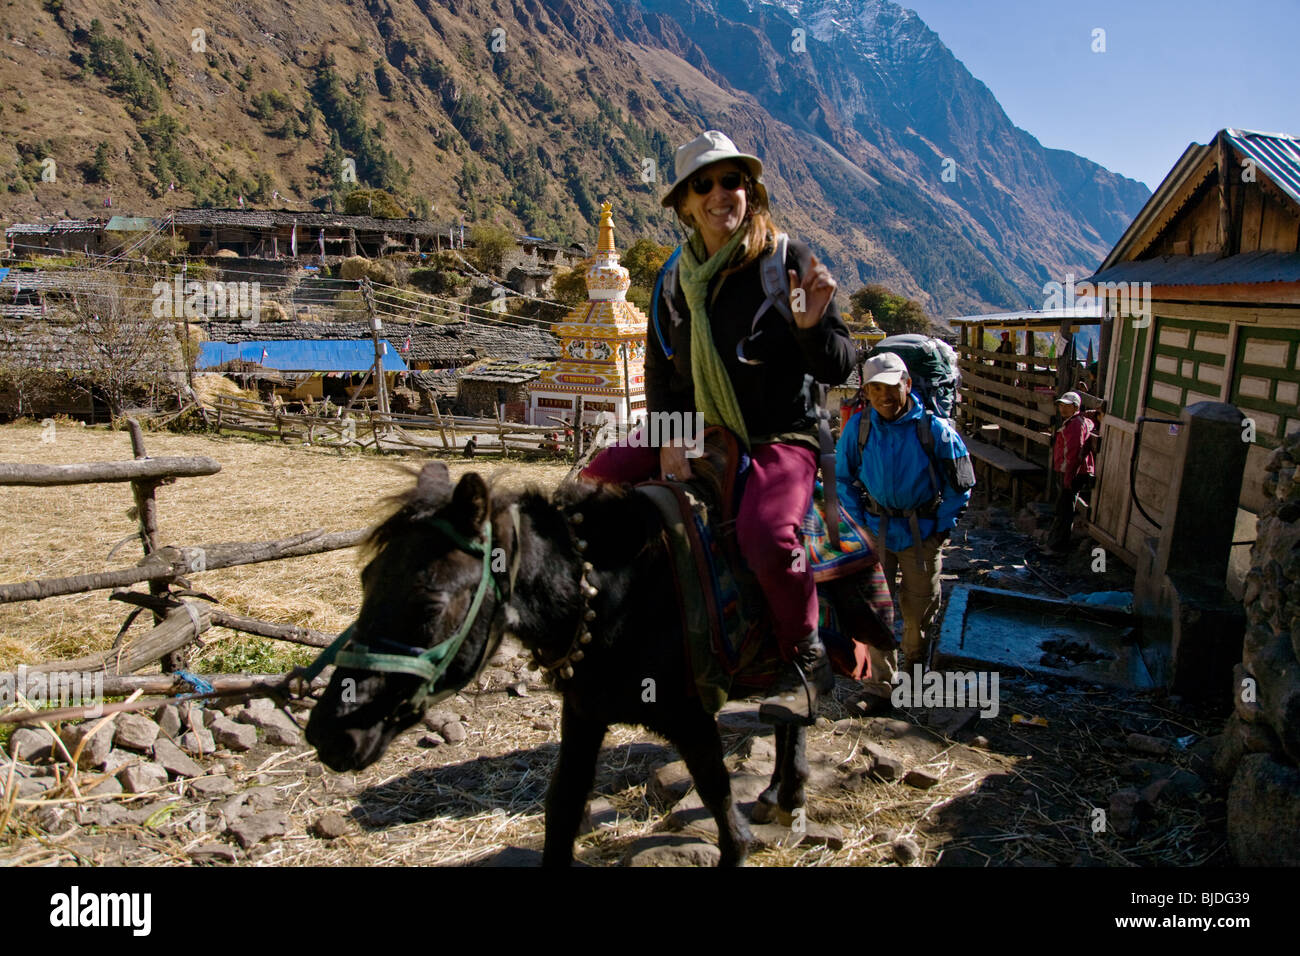 Christine Kolisch rides a horse through the village of LHO on the Around Manaslu Trek - NUPRI REGION, NEPAL - Stock Image